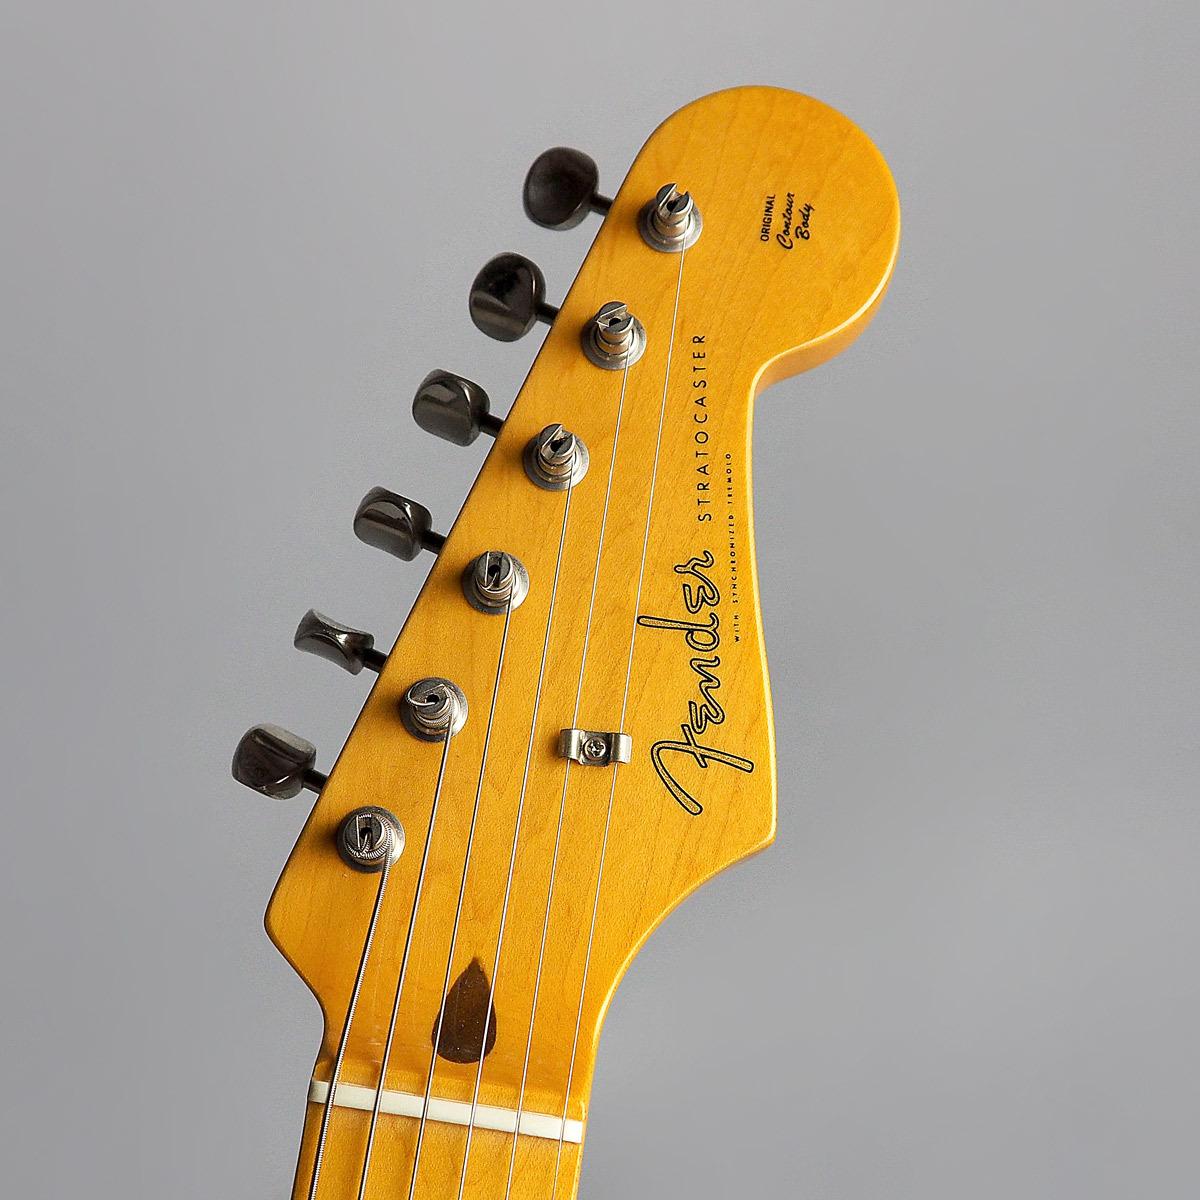 ST57 DiMarzio Collection Pickupのヘッド画像